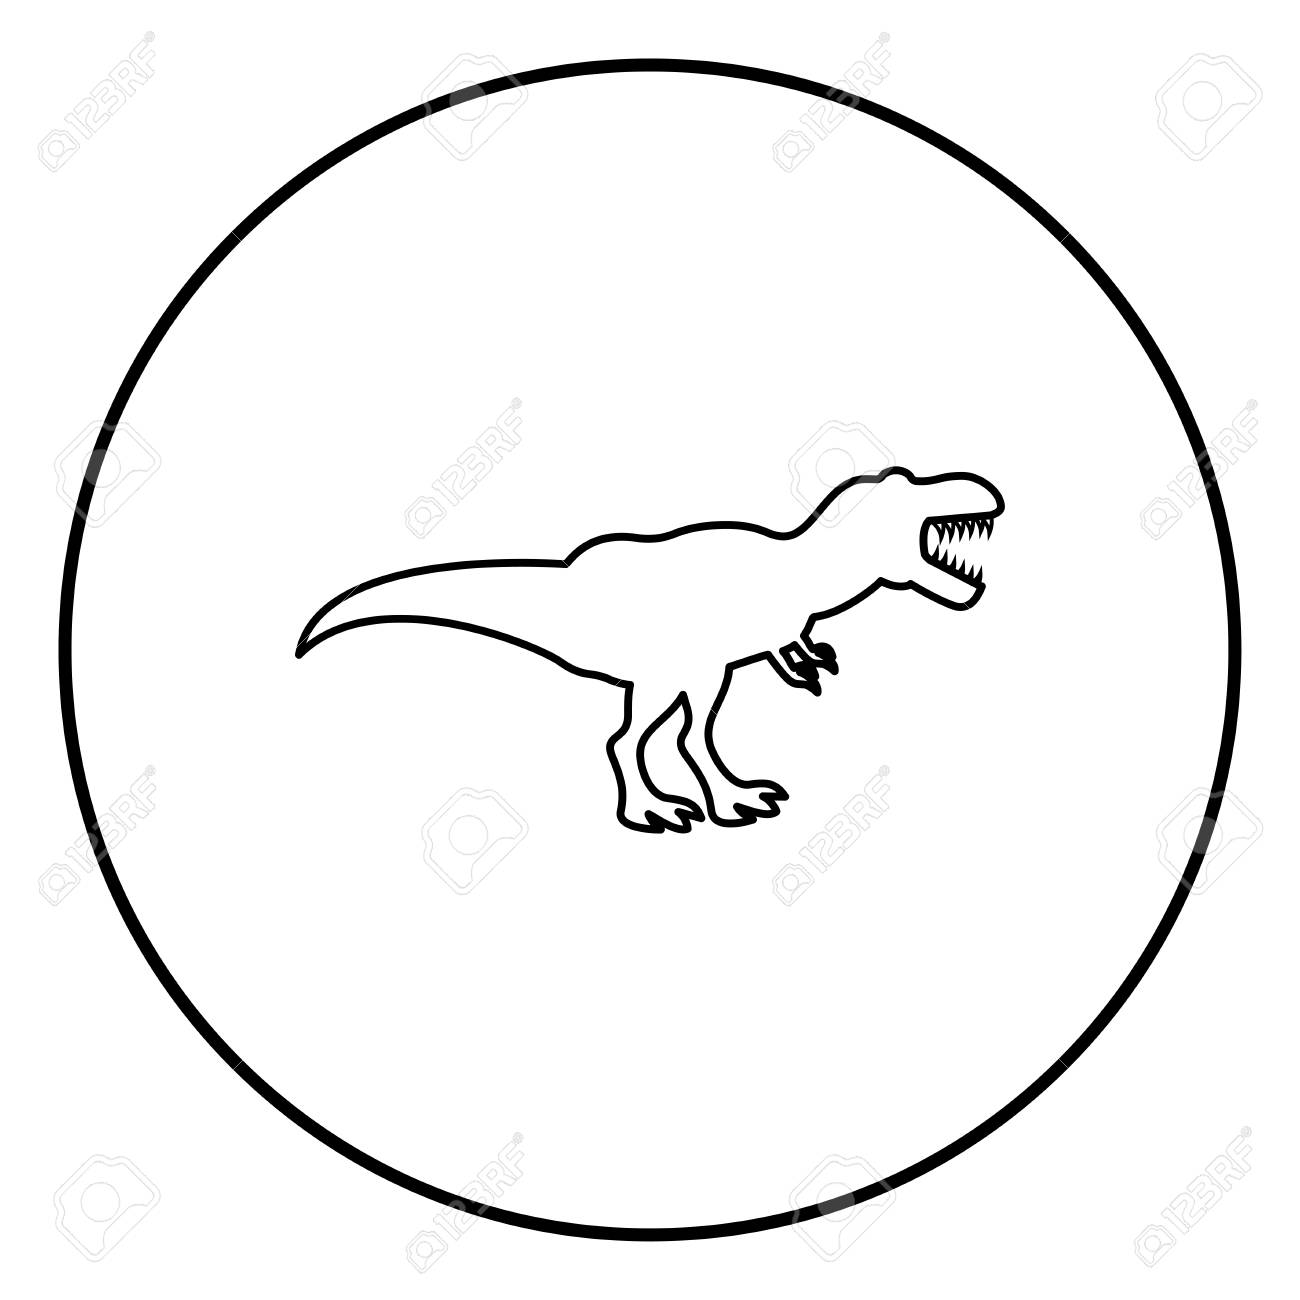 Dinosaur tyrannosaurus t rex icon black color in circle round outline - 103694887